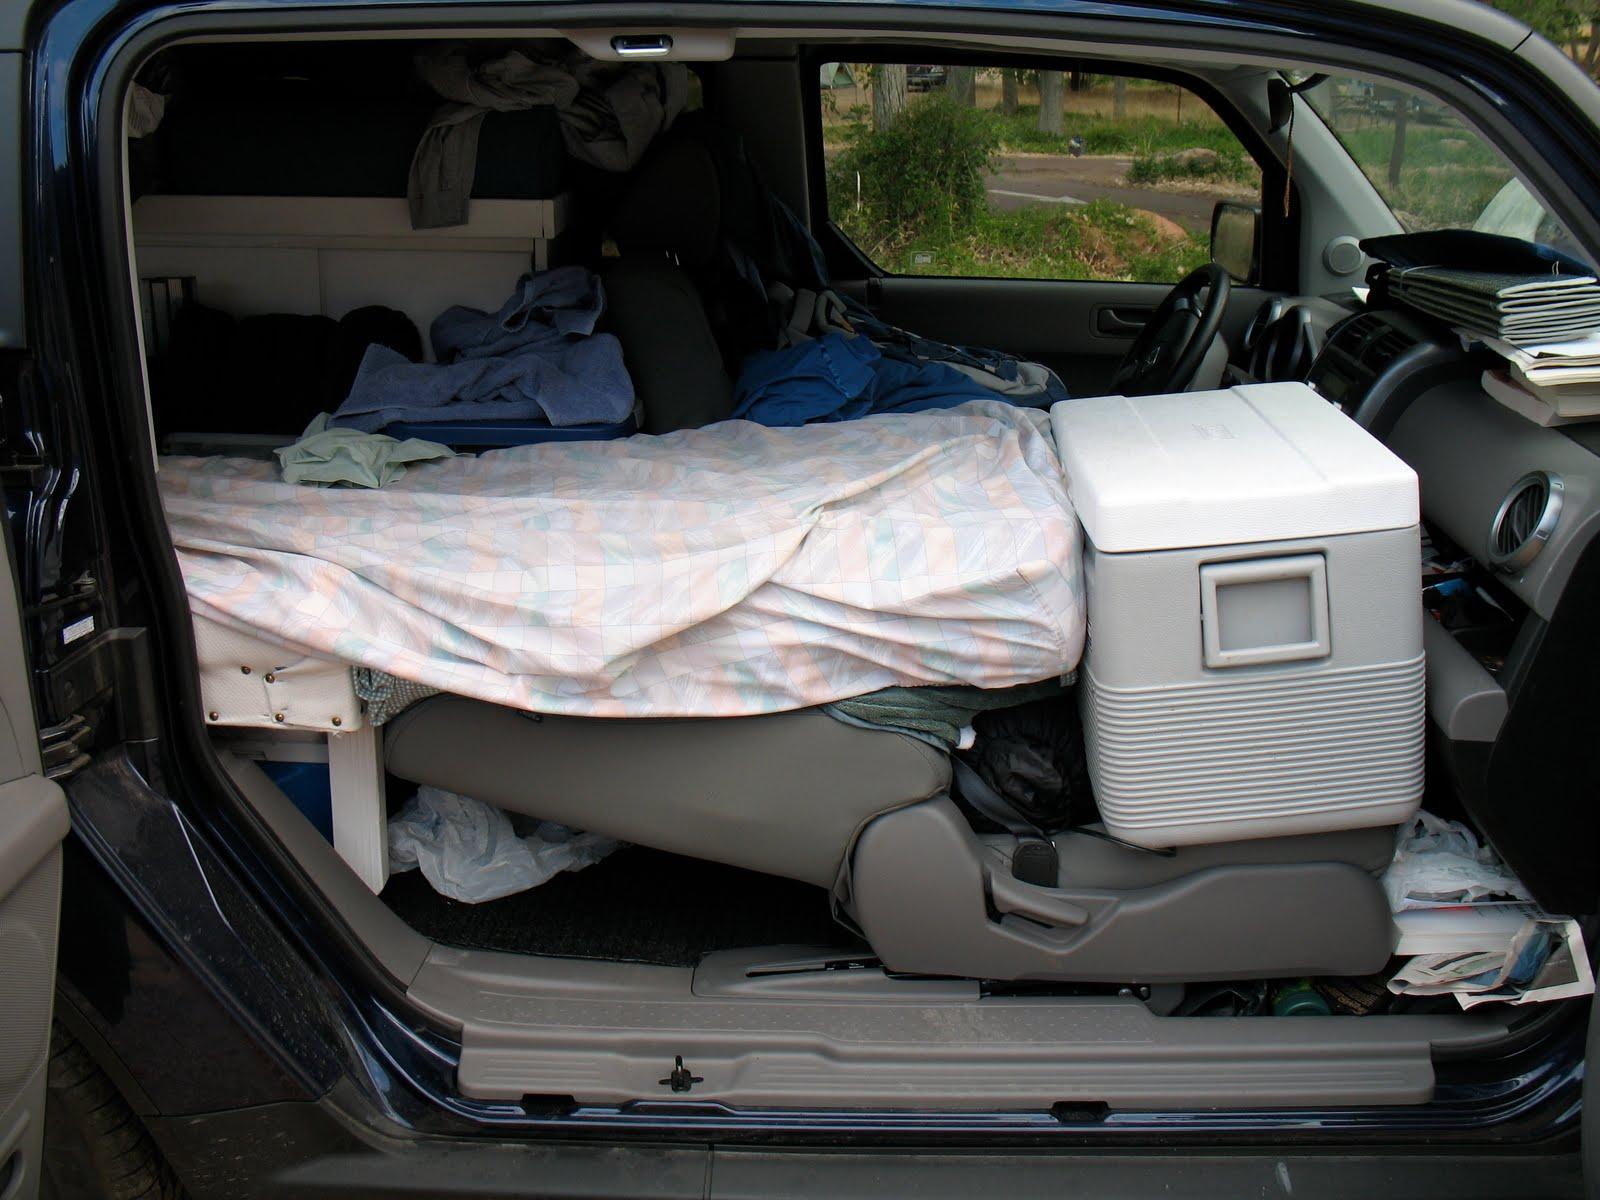 Eric s Travel Blog My Bedroom in My Car